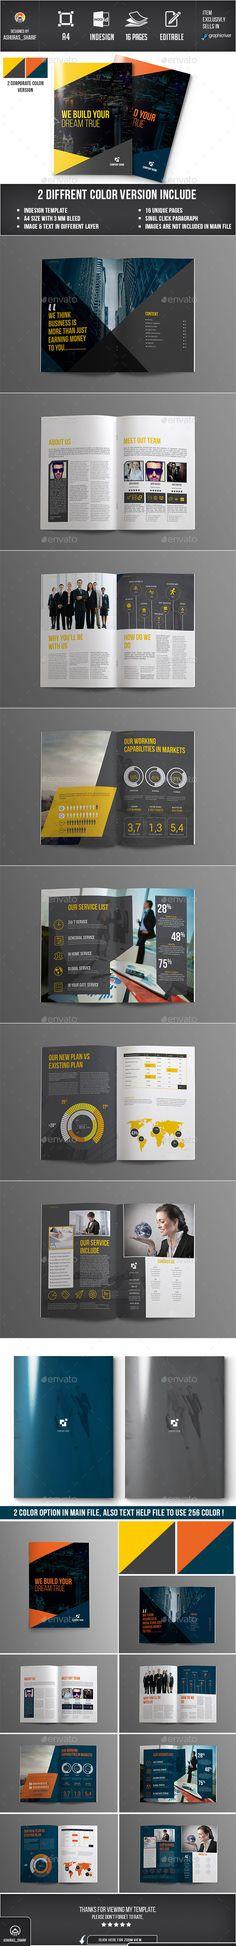 Corporate Brochure Template #design Download: http://graphicriver.net/item/corporate-brochure-template/12189182?ref=ksioks